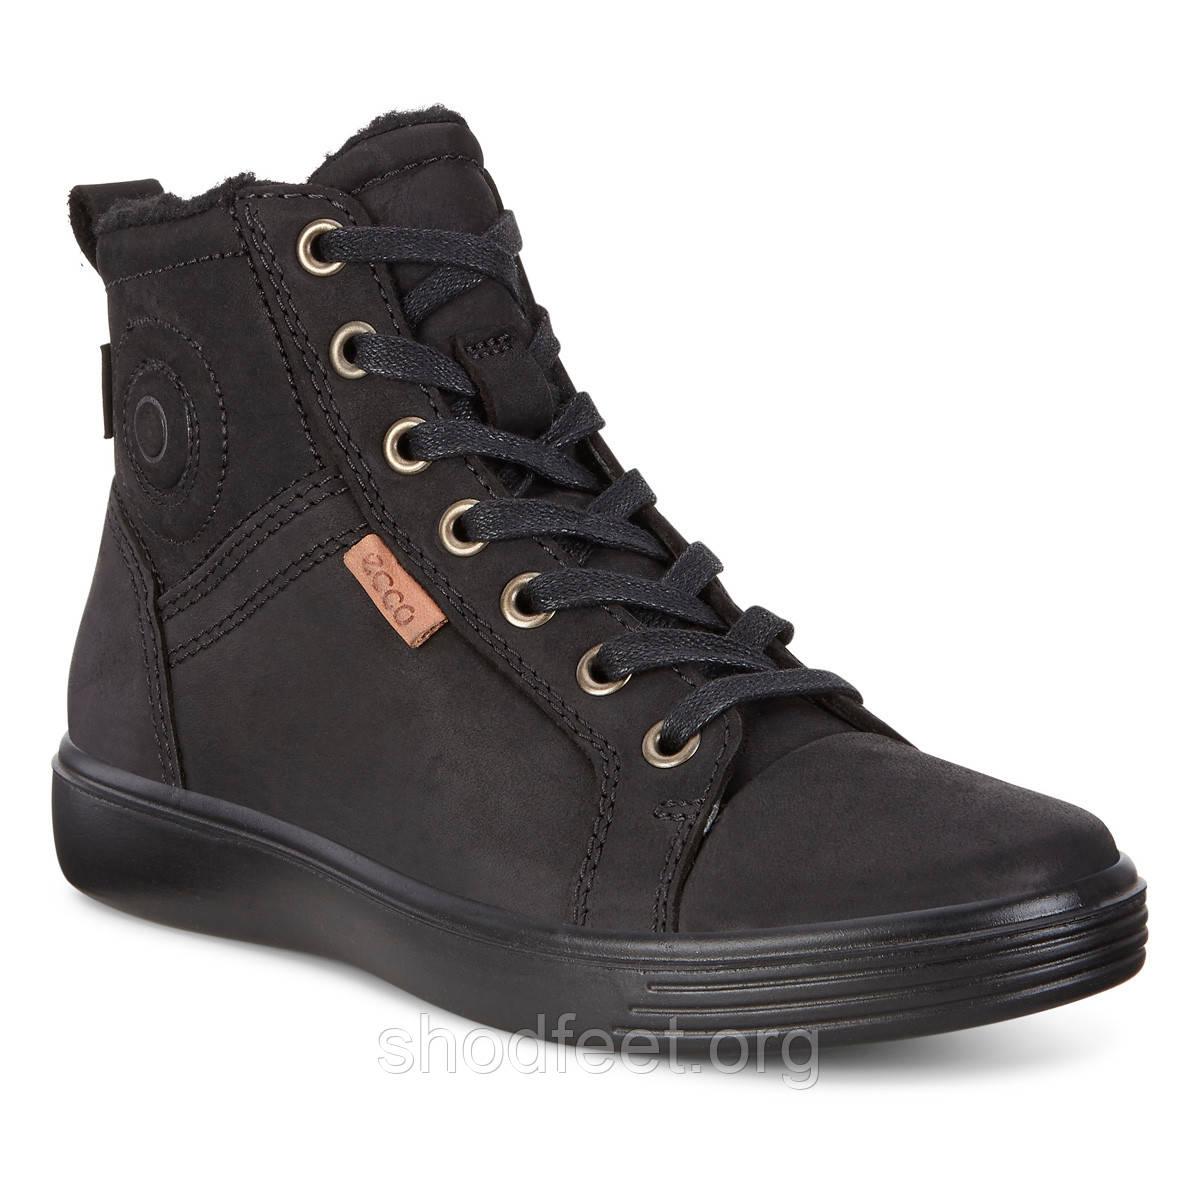 Ботинки Ecco S7 Teen Gore-Tex 780073-51052